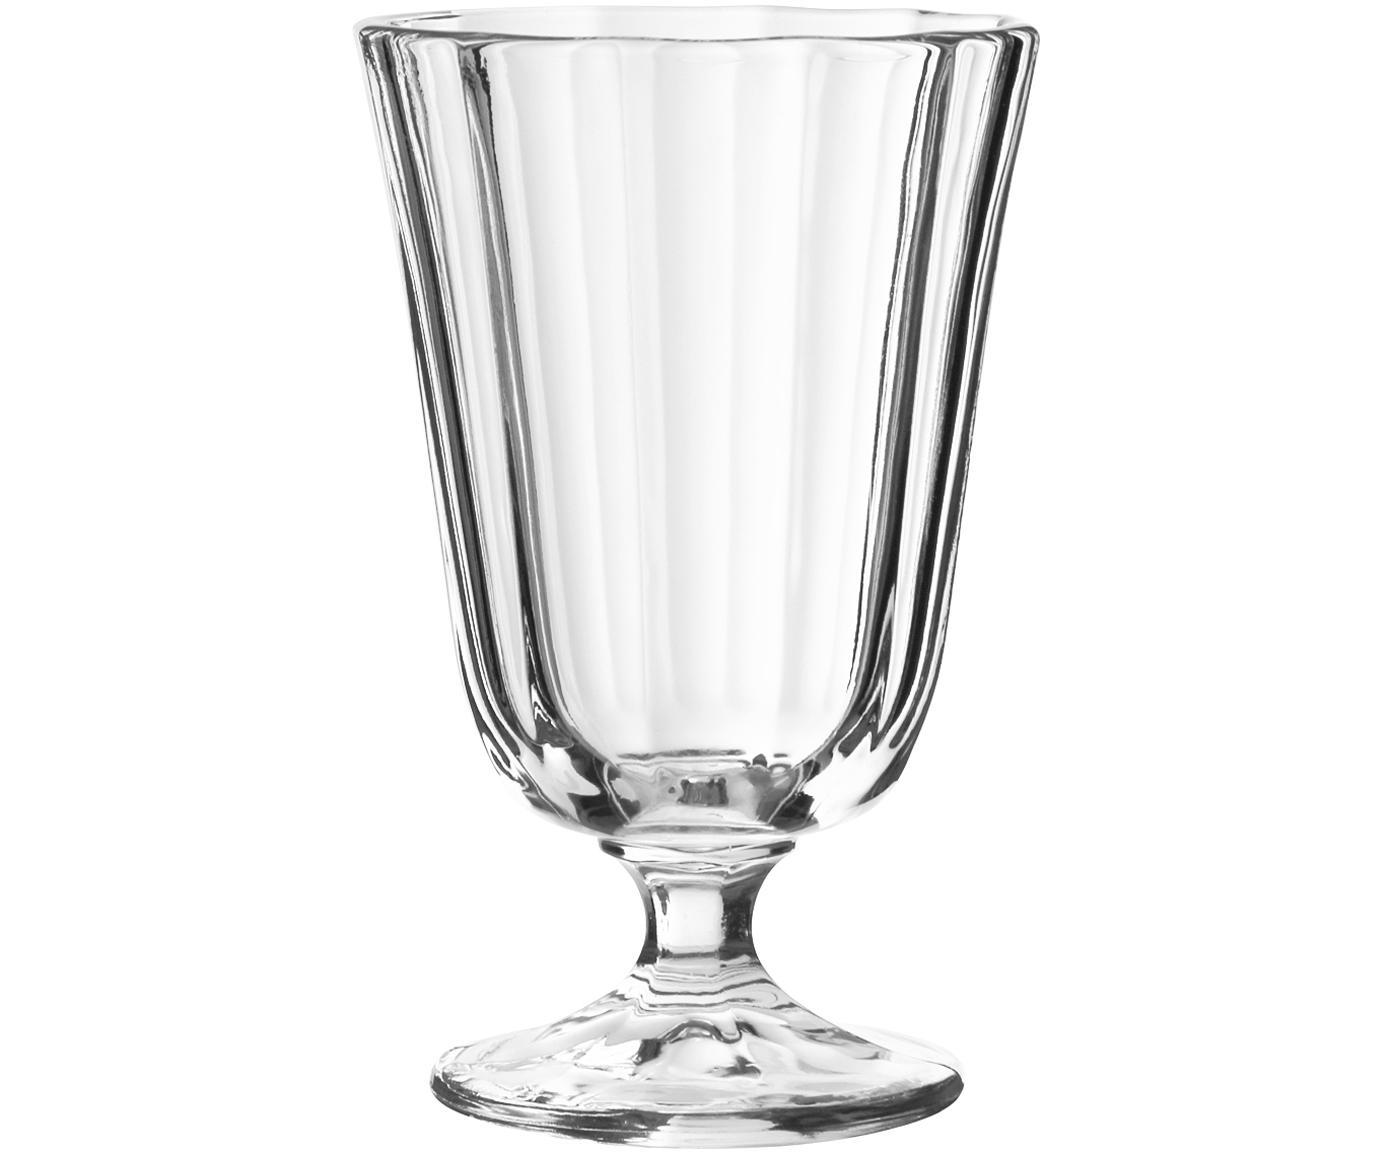 Kleine wijnglazen Ana in landelijke stijl, 12-delig, Glas, Transparant, 195 ml